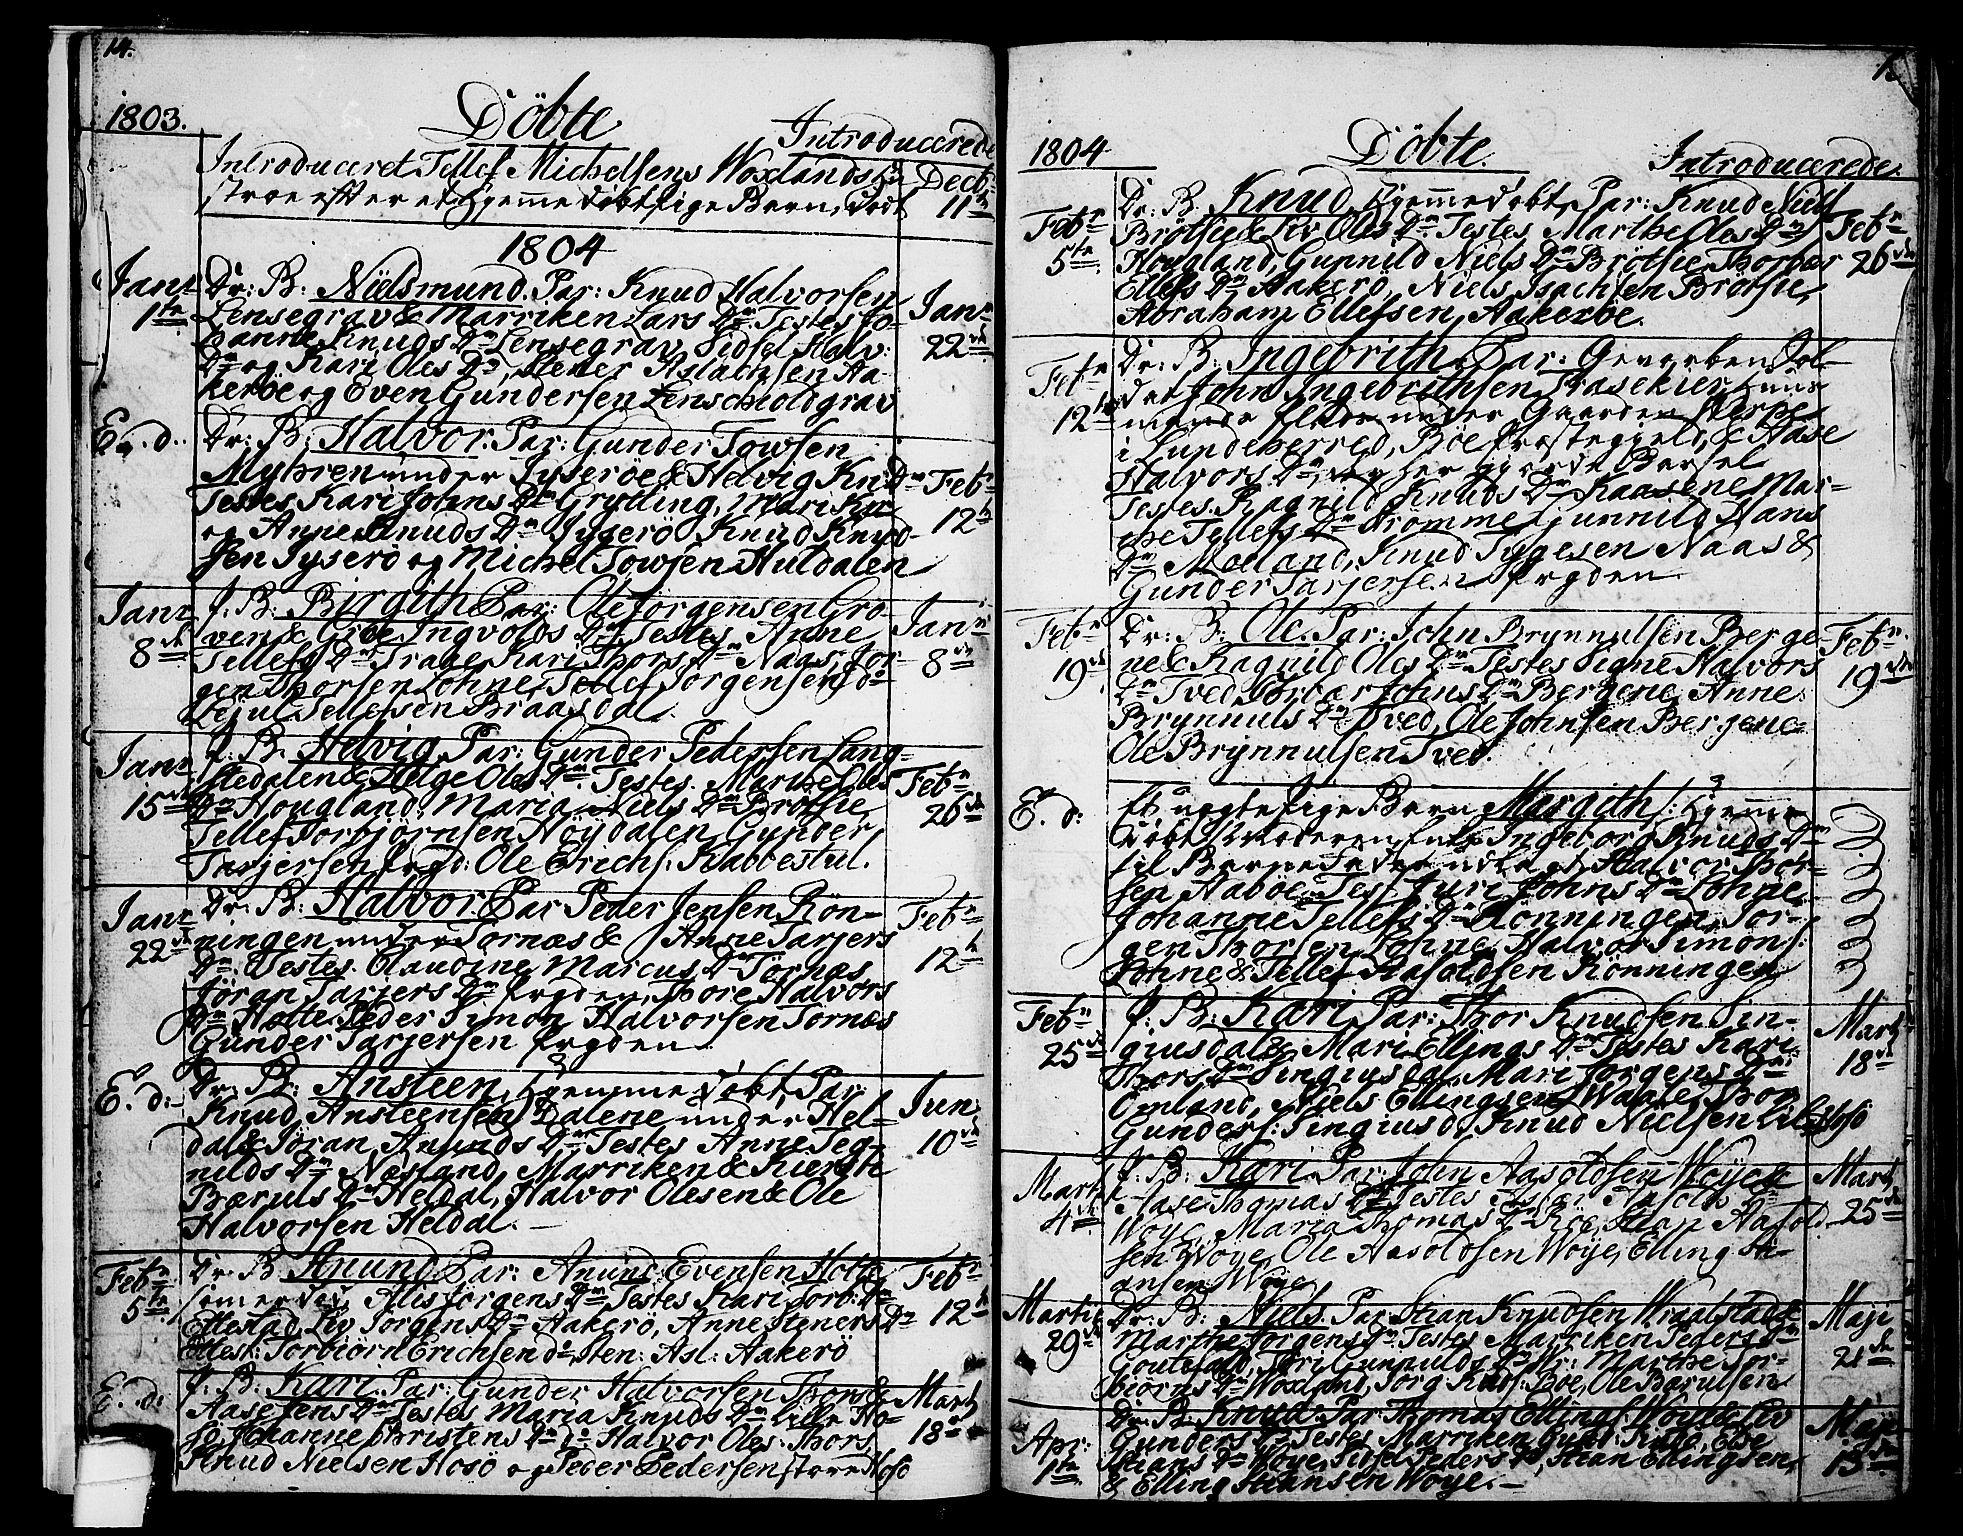 SAKO, Drangedal kirkebøker, F/Fa/L0004: Ministerialbok nr. 4, 1802-1814, s. 14-15